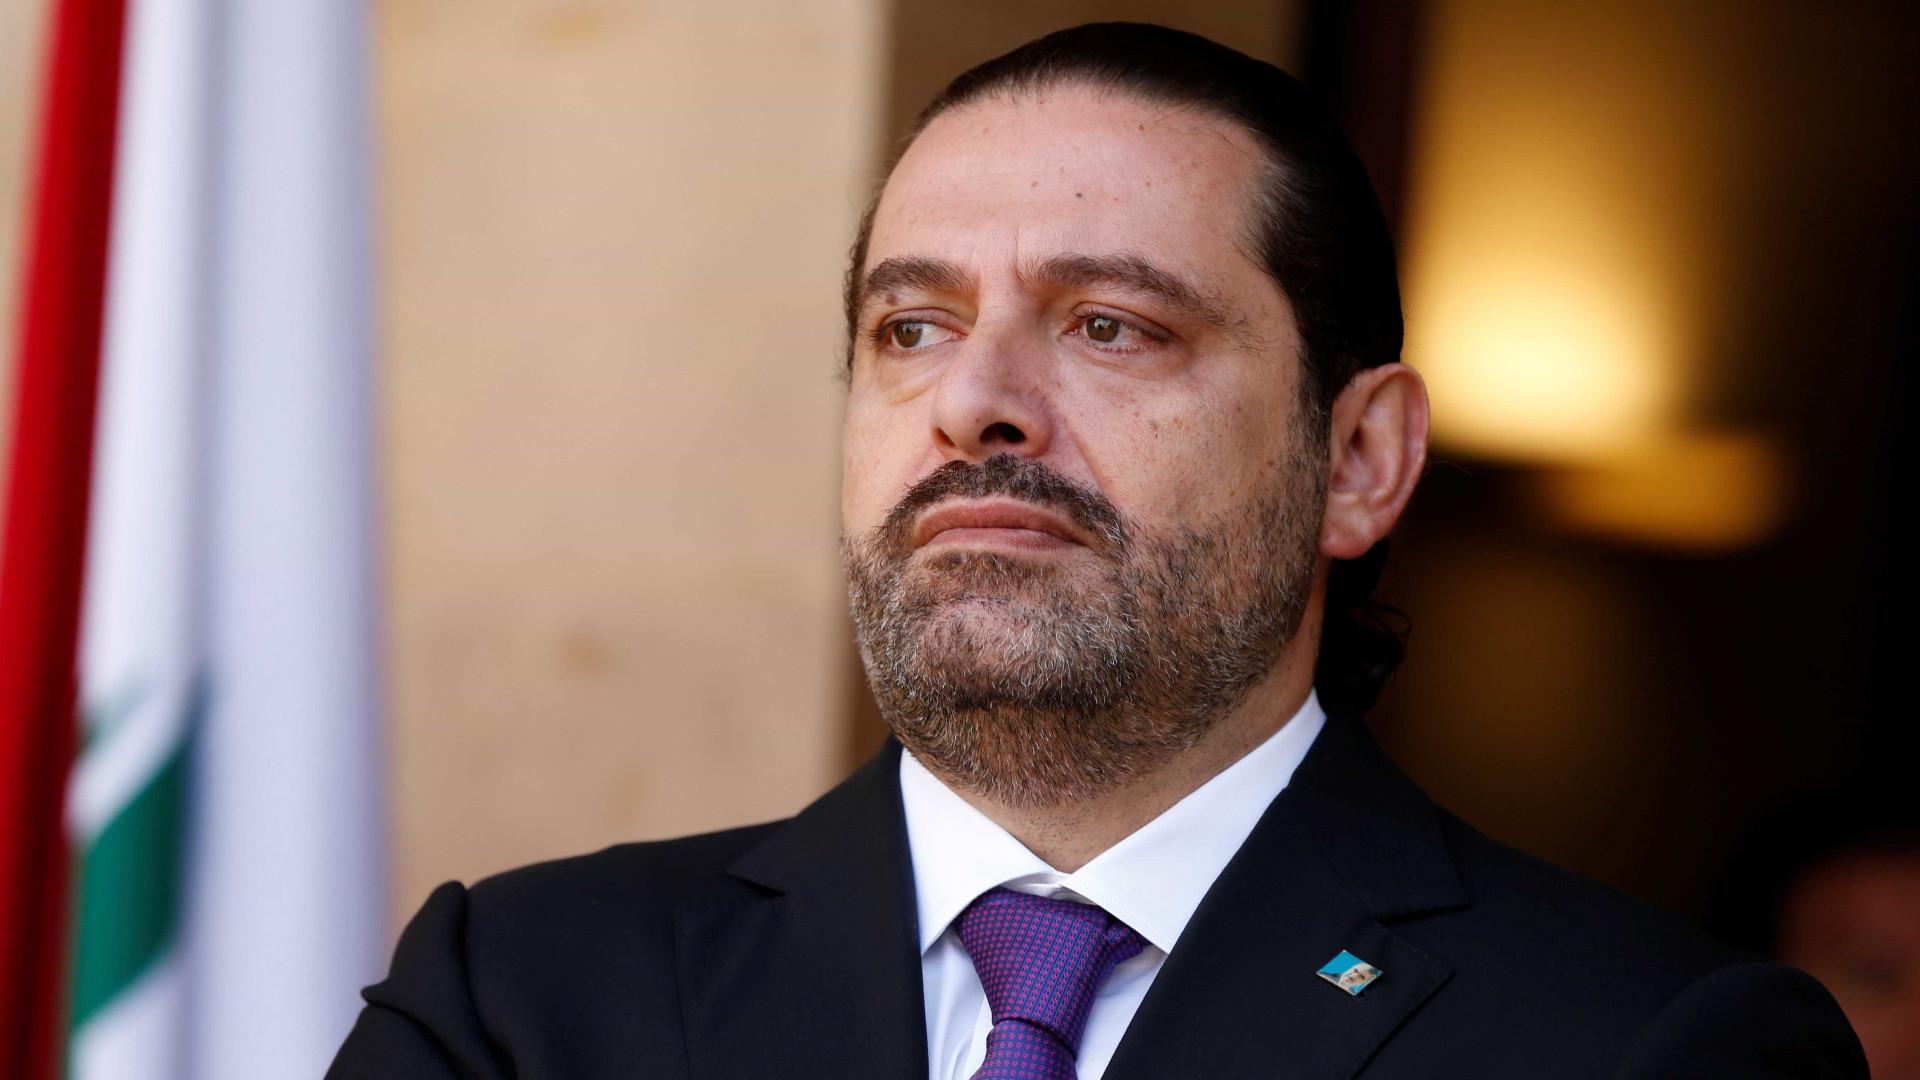 Presidente do Líbano diz que Hariri está mesmo detido na Arábia Saudita